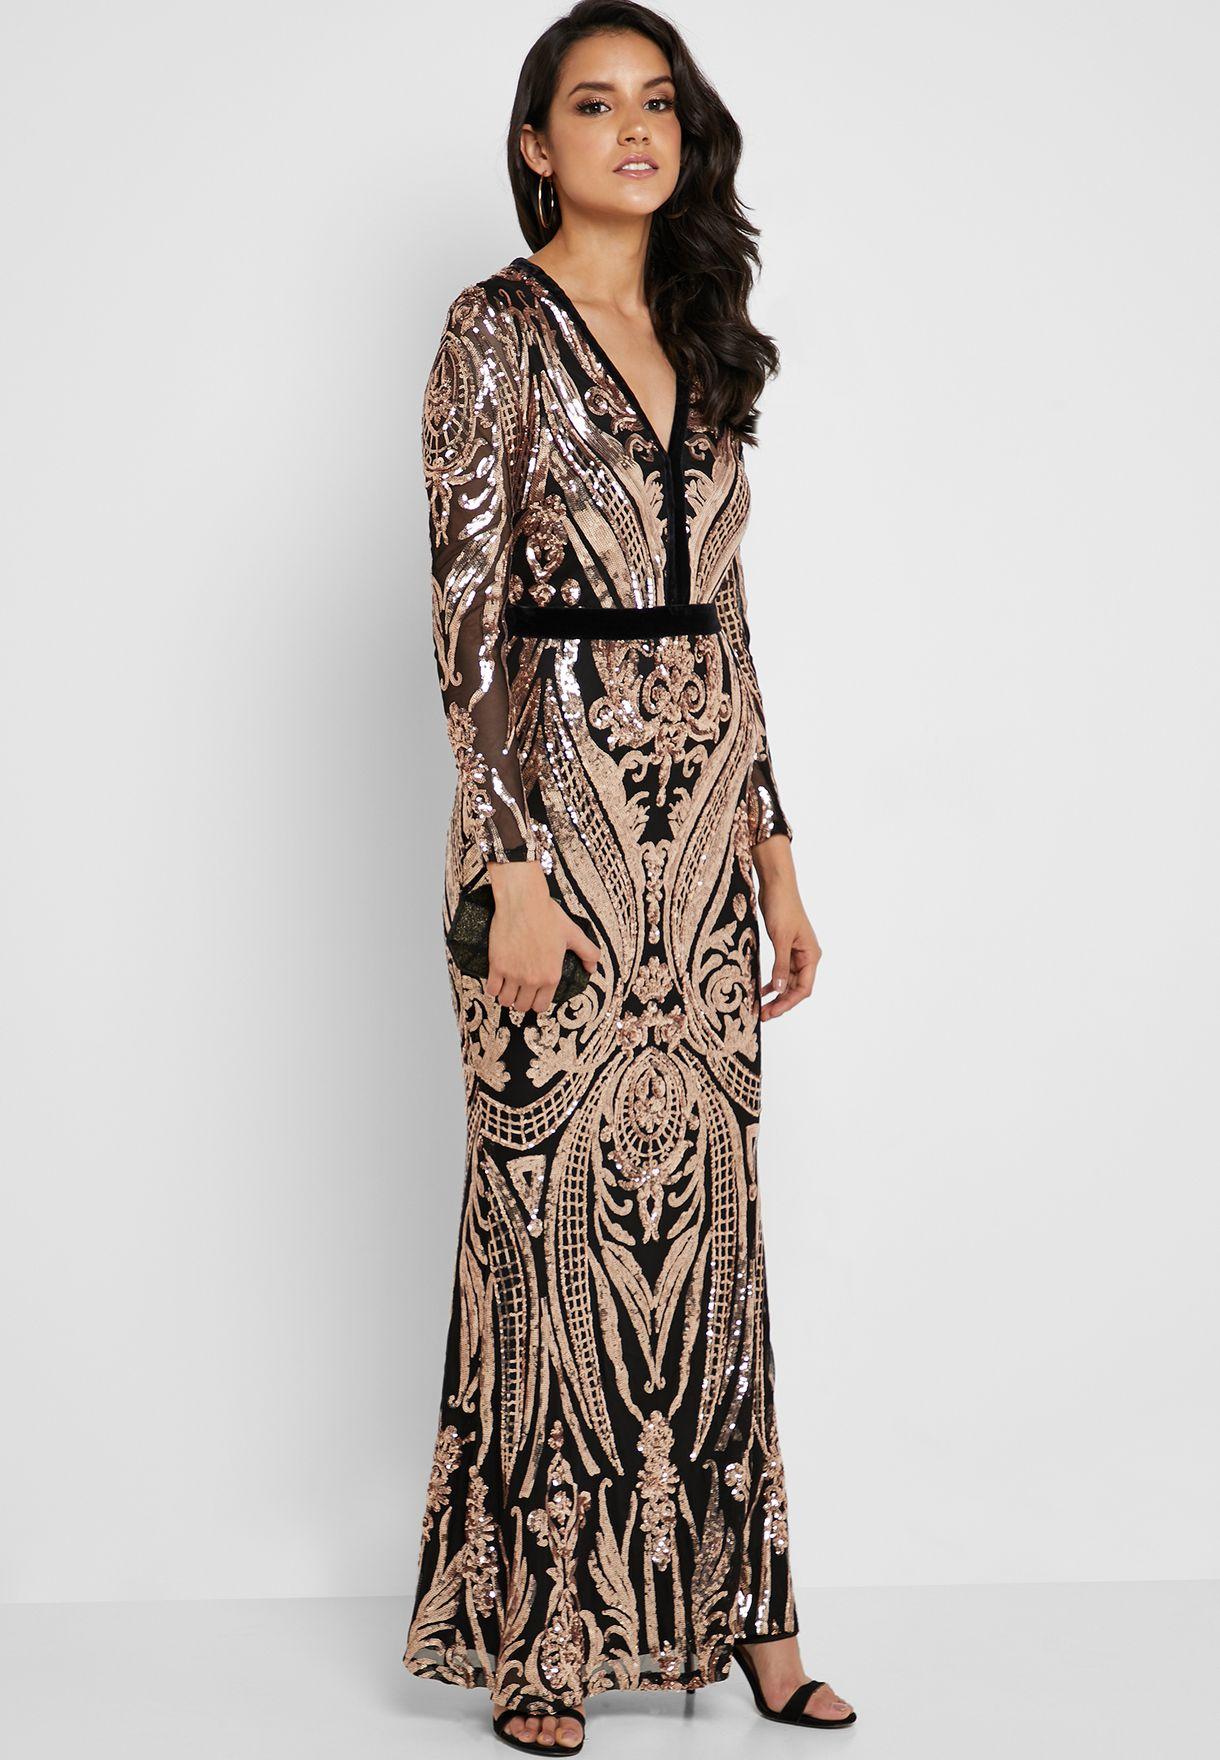 Buy Quiz Black Sequin Embellished Fishtail Dress For Women In Mena Worldwide 100015233